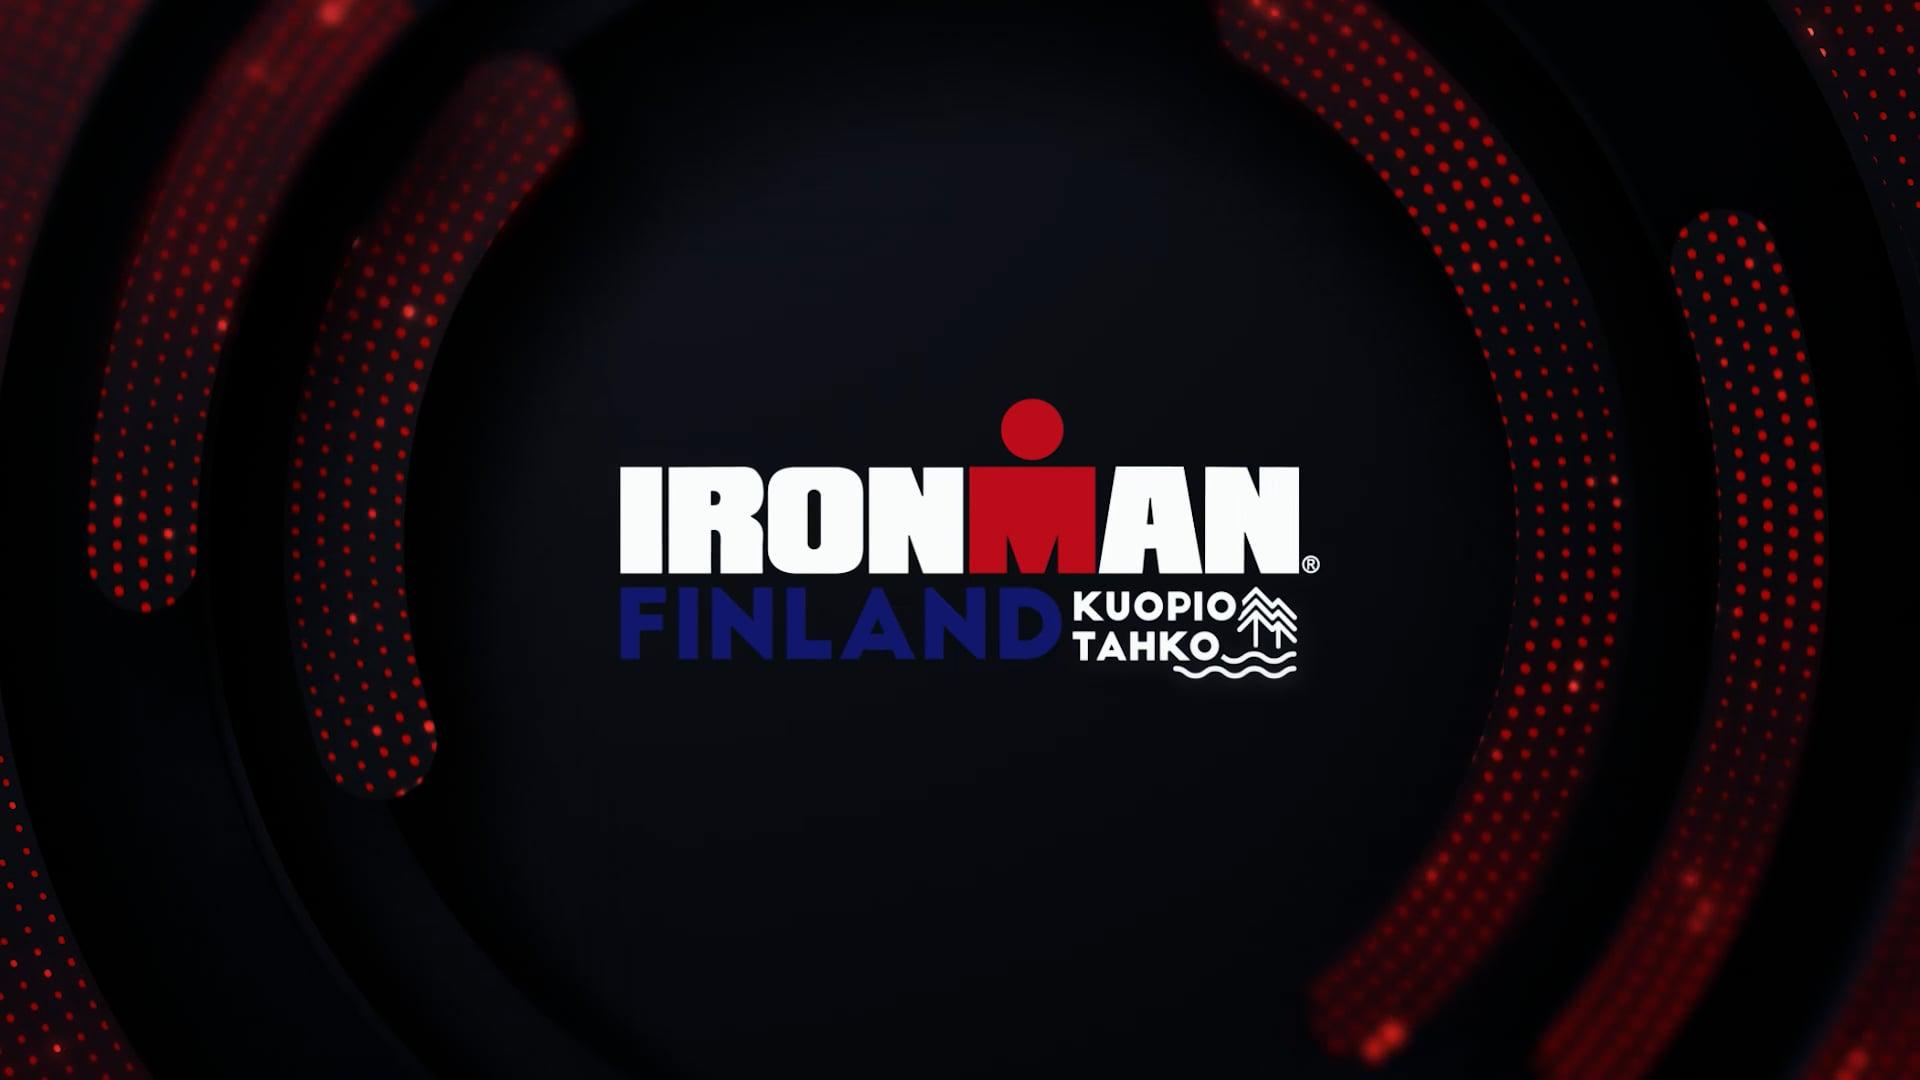 Ironman   Lahti, Finland